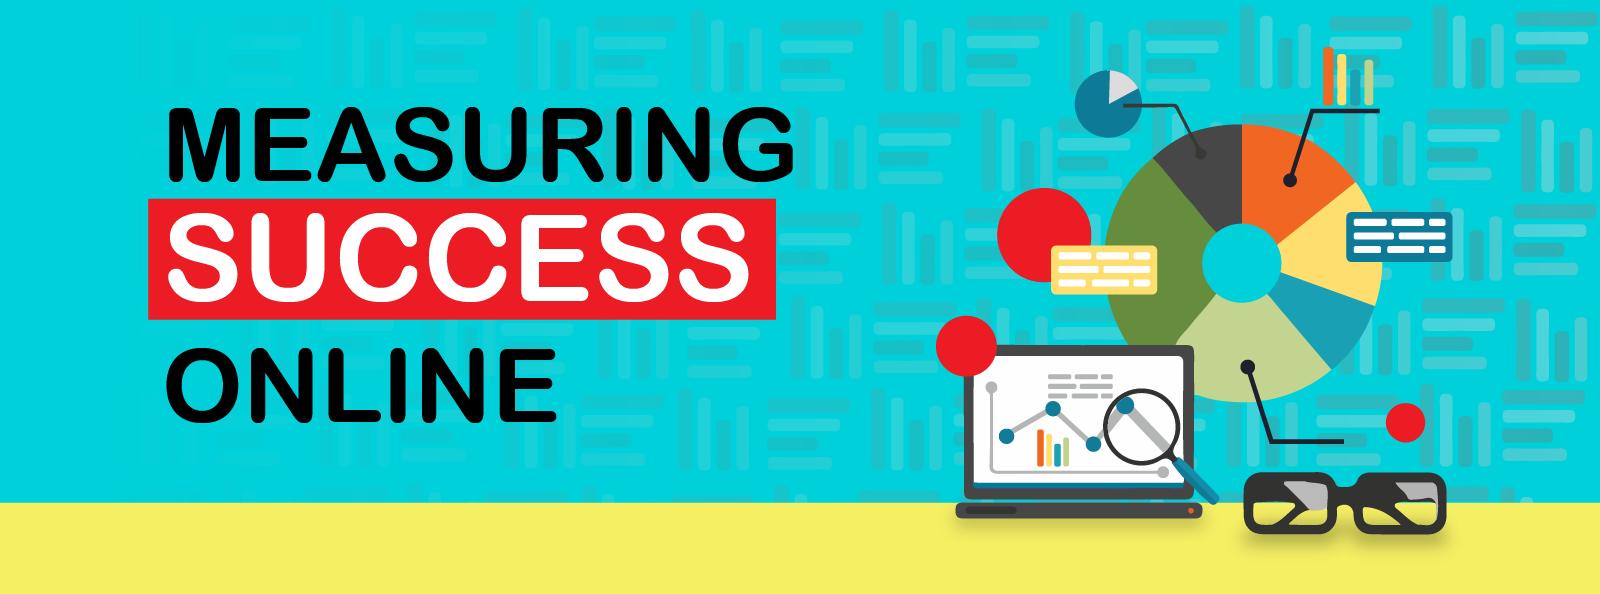 Tips-for-Measuring-Success-Online-TrainingWebsite-1600x594